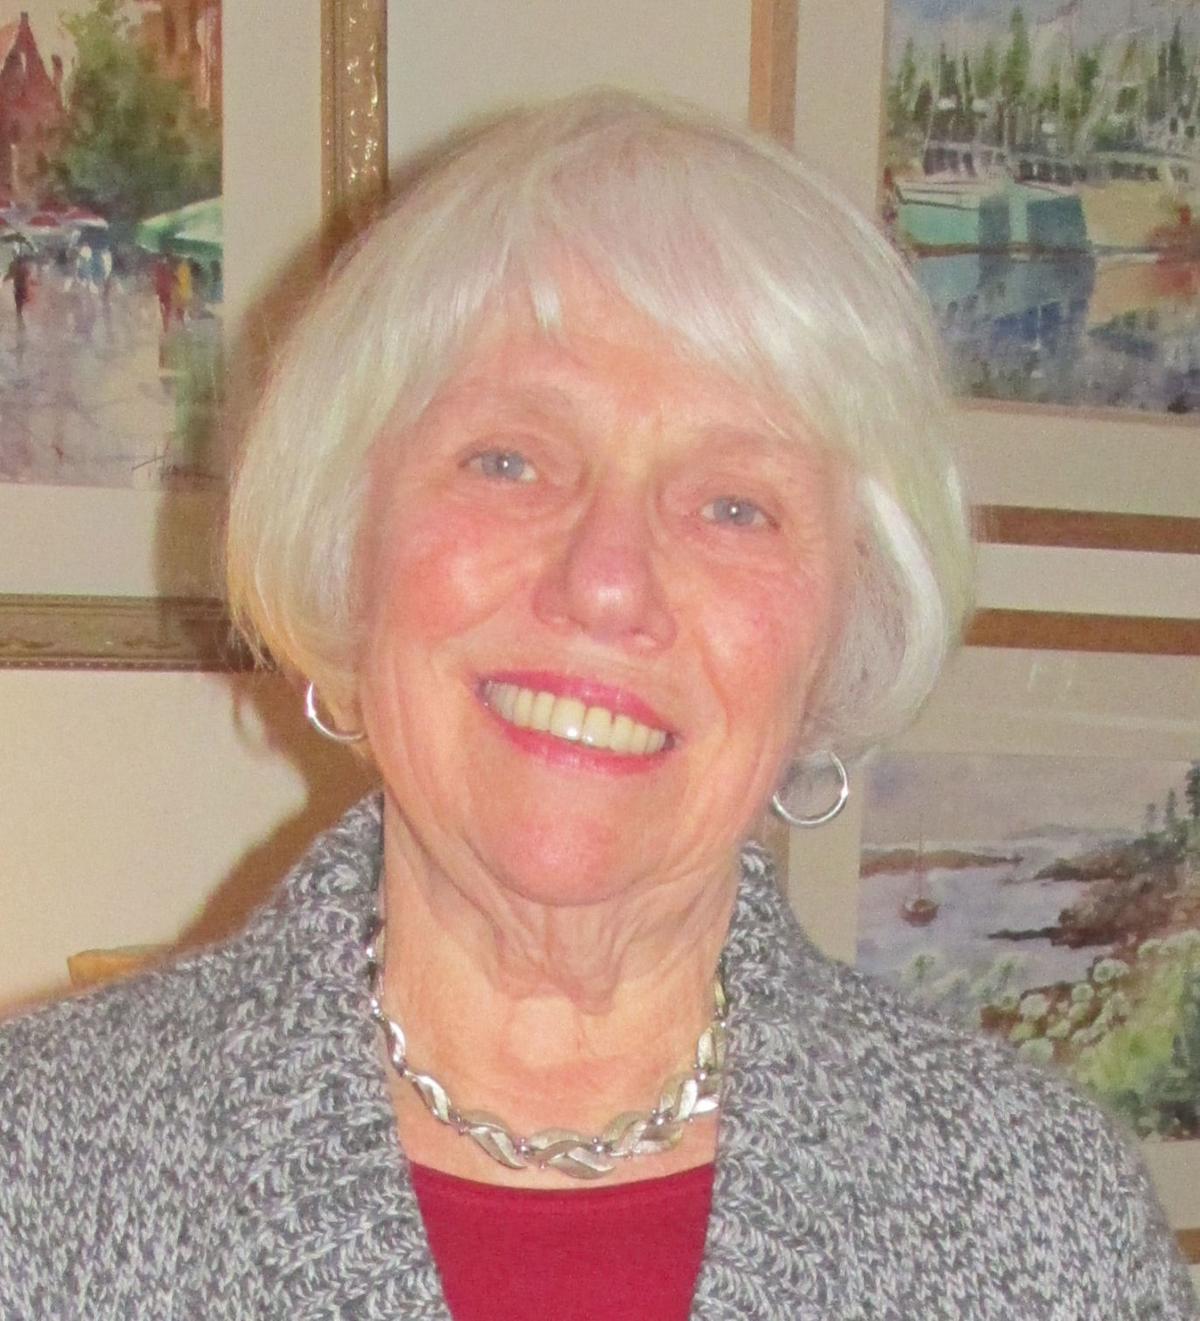 Marge Cushing - WEB STETHEAD